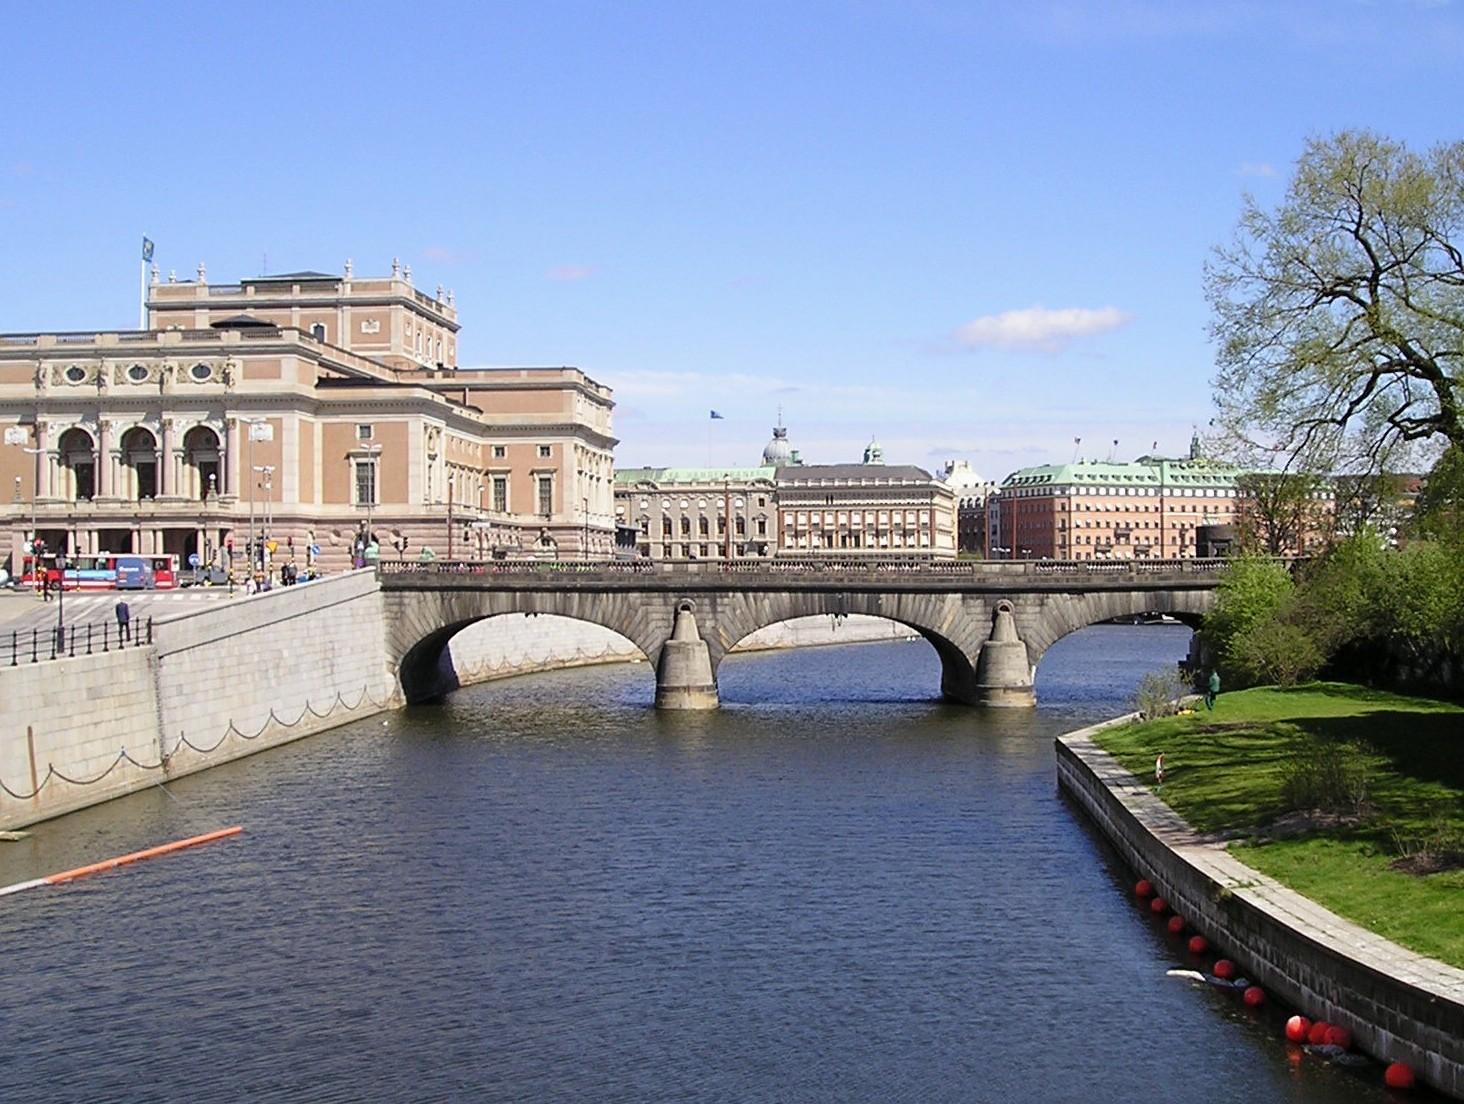 1772 in Sweden